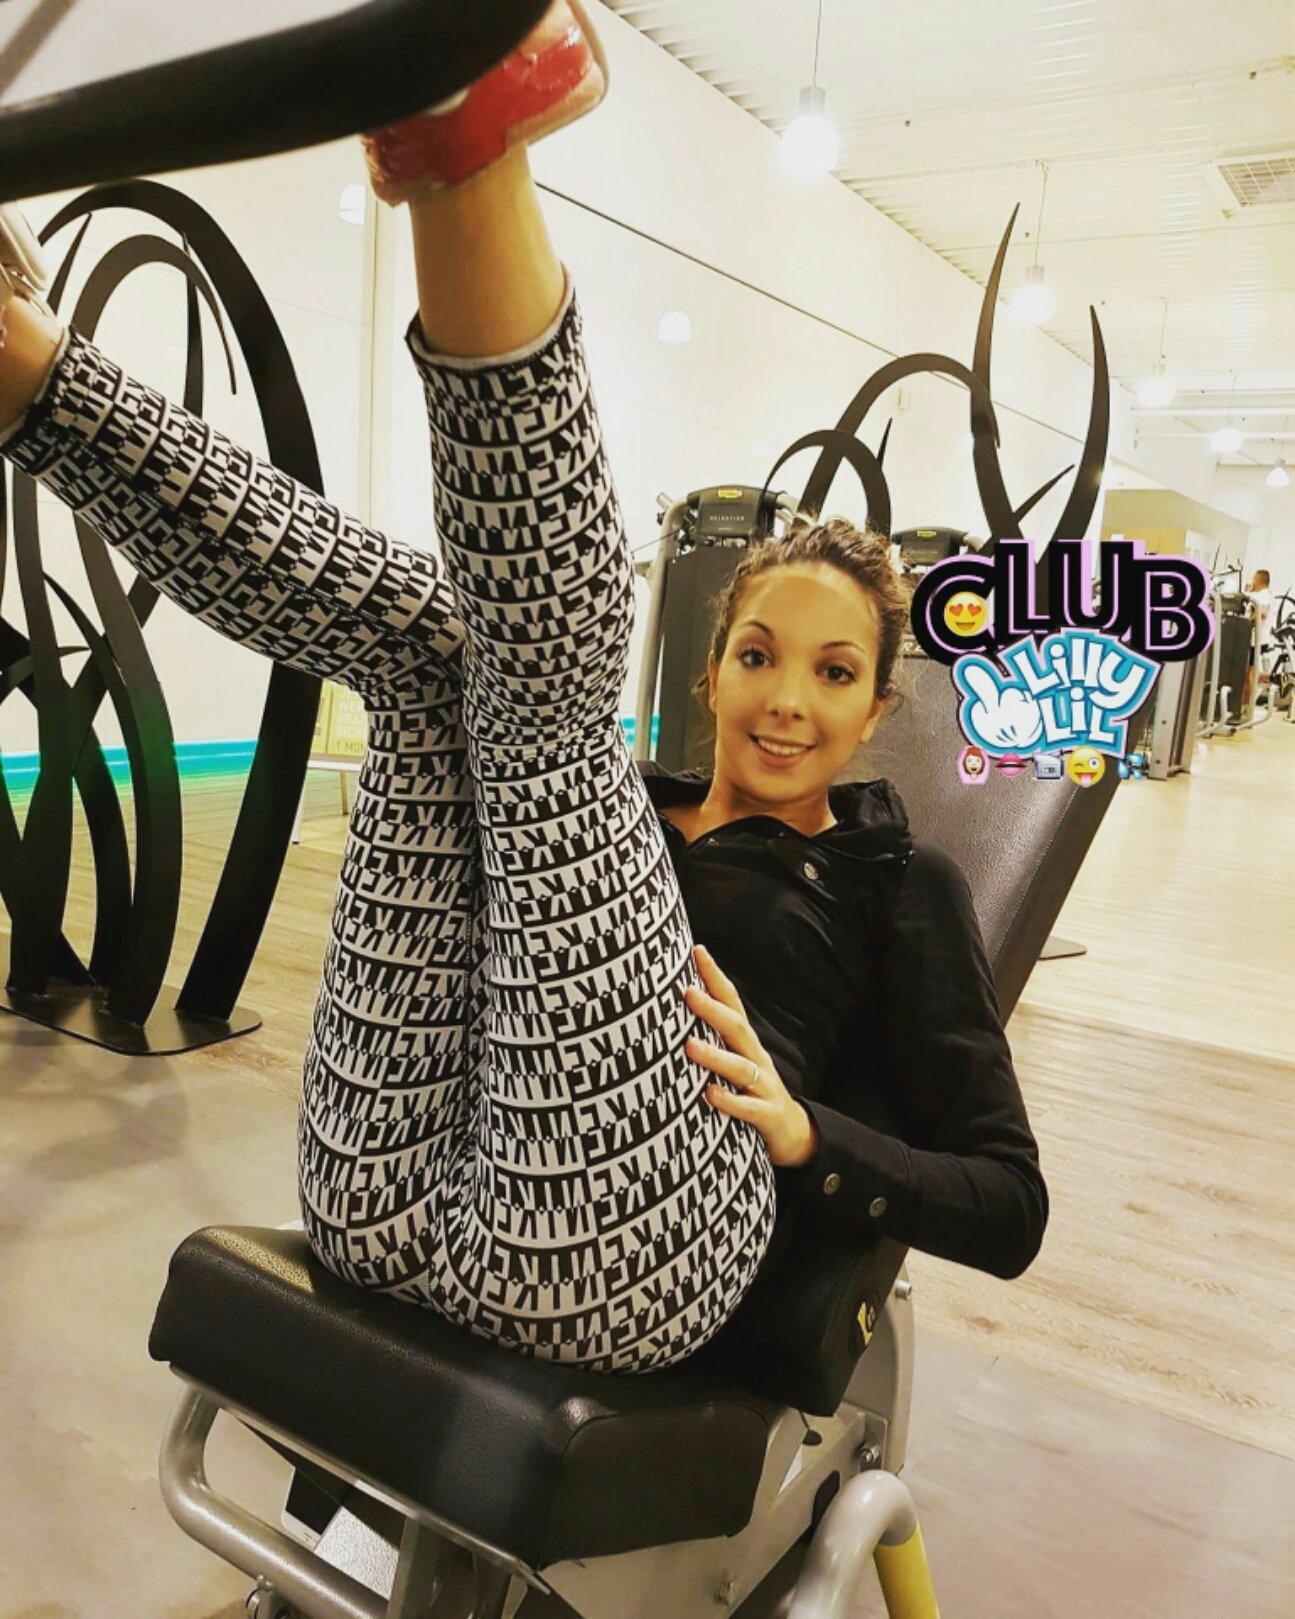 Club Lilly-Lil on Twitter: GYM 😉💪💪💪💪 ============ #